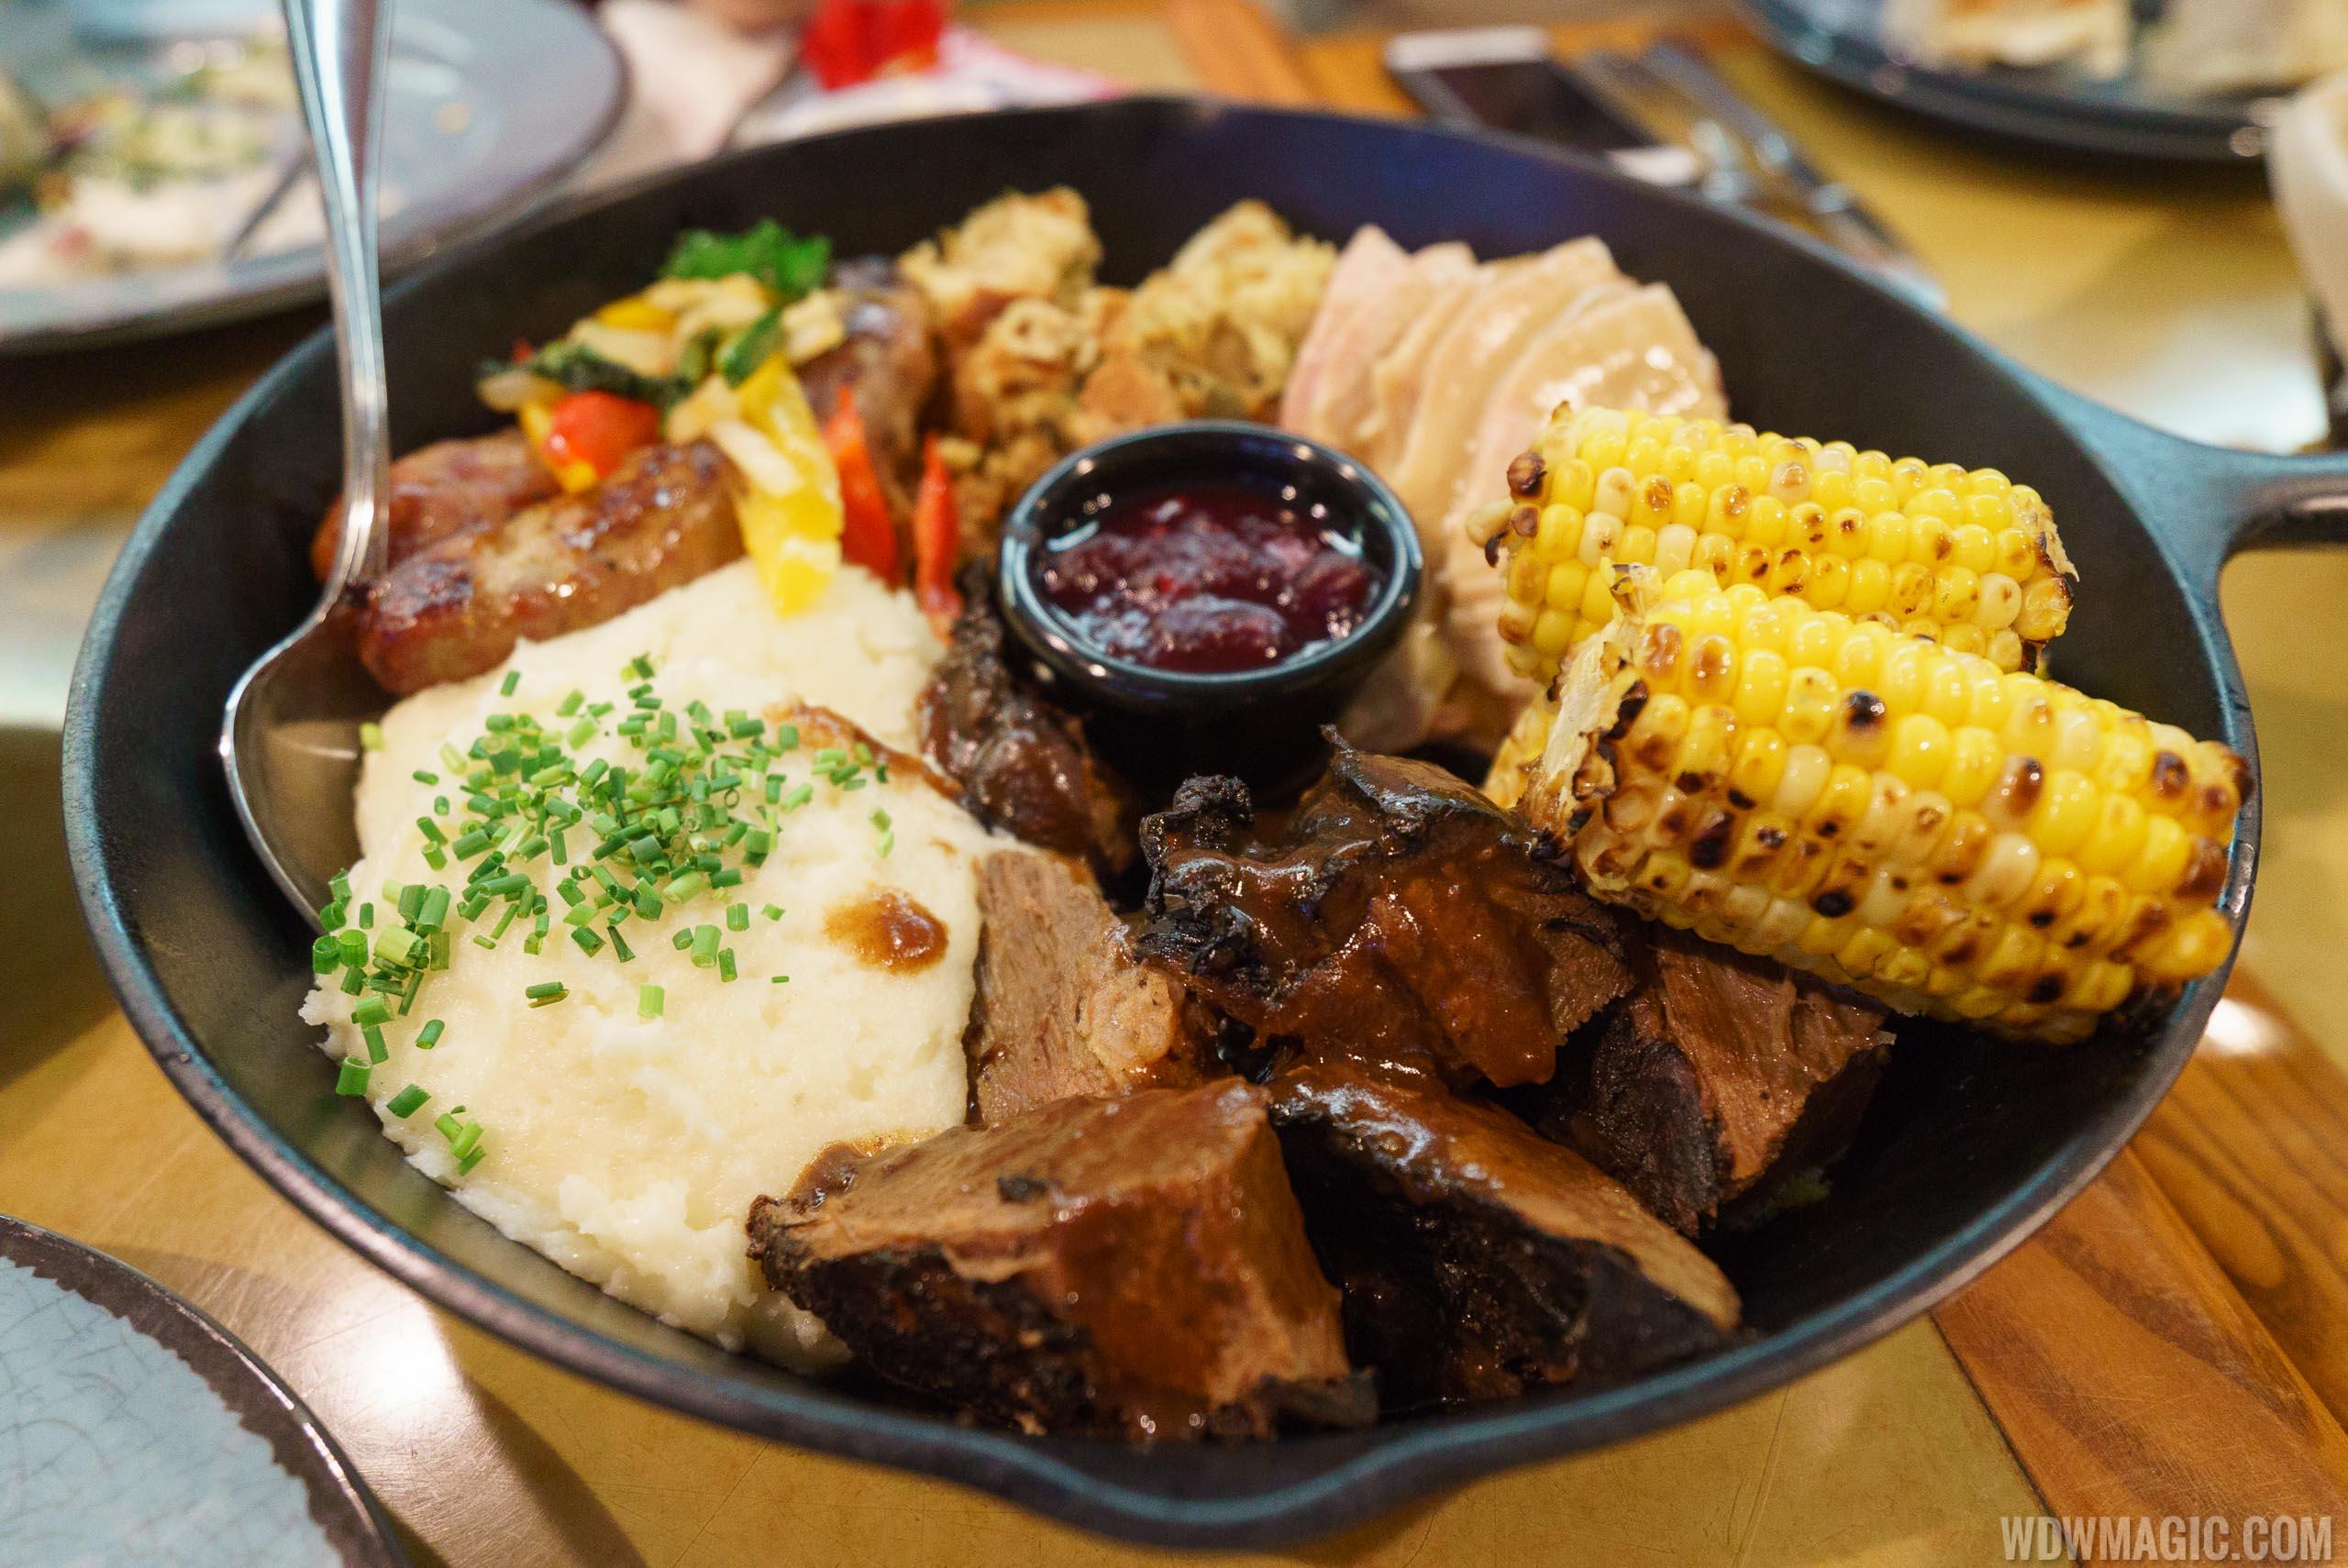 Garden Grill dinner - Photo 4 of 9